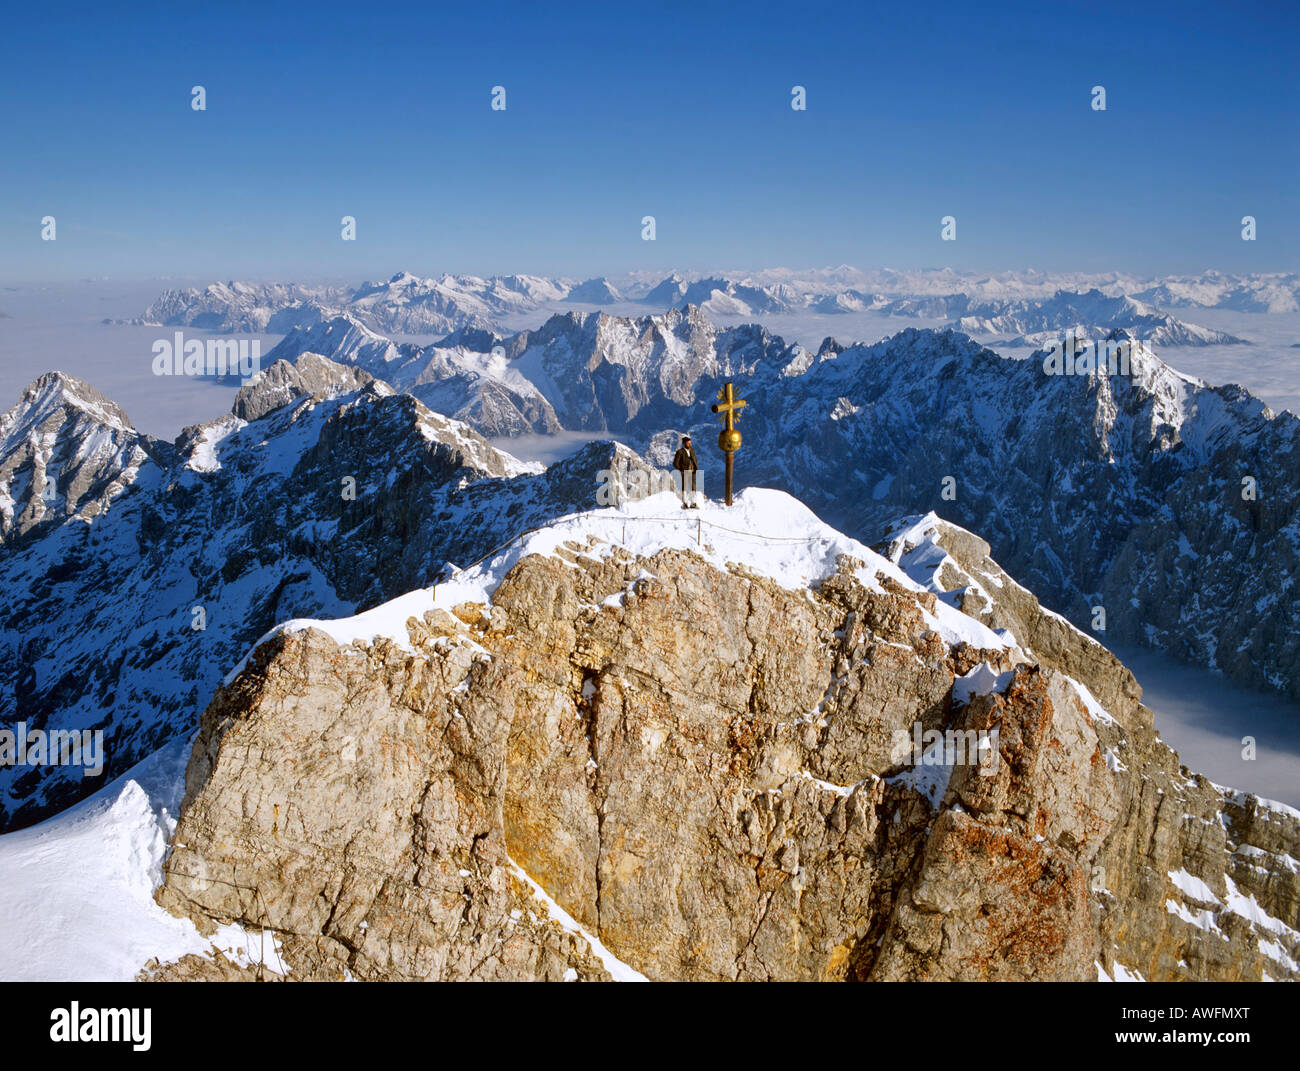 Panoramic view of the summit cross on Mt. Zugspitze, Wetterstein Range, Upper Bavaria, Bavaria, Germany, Europe - Stock Image